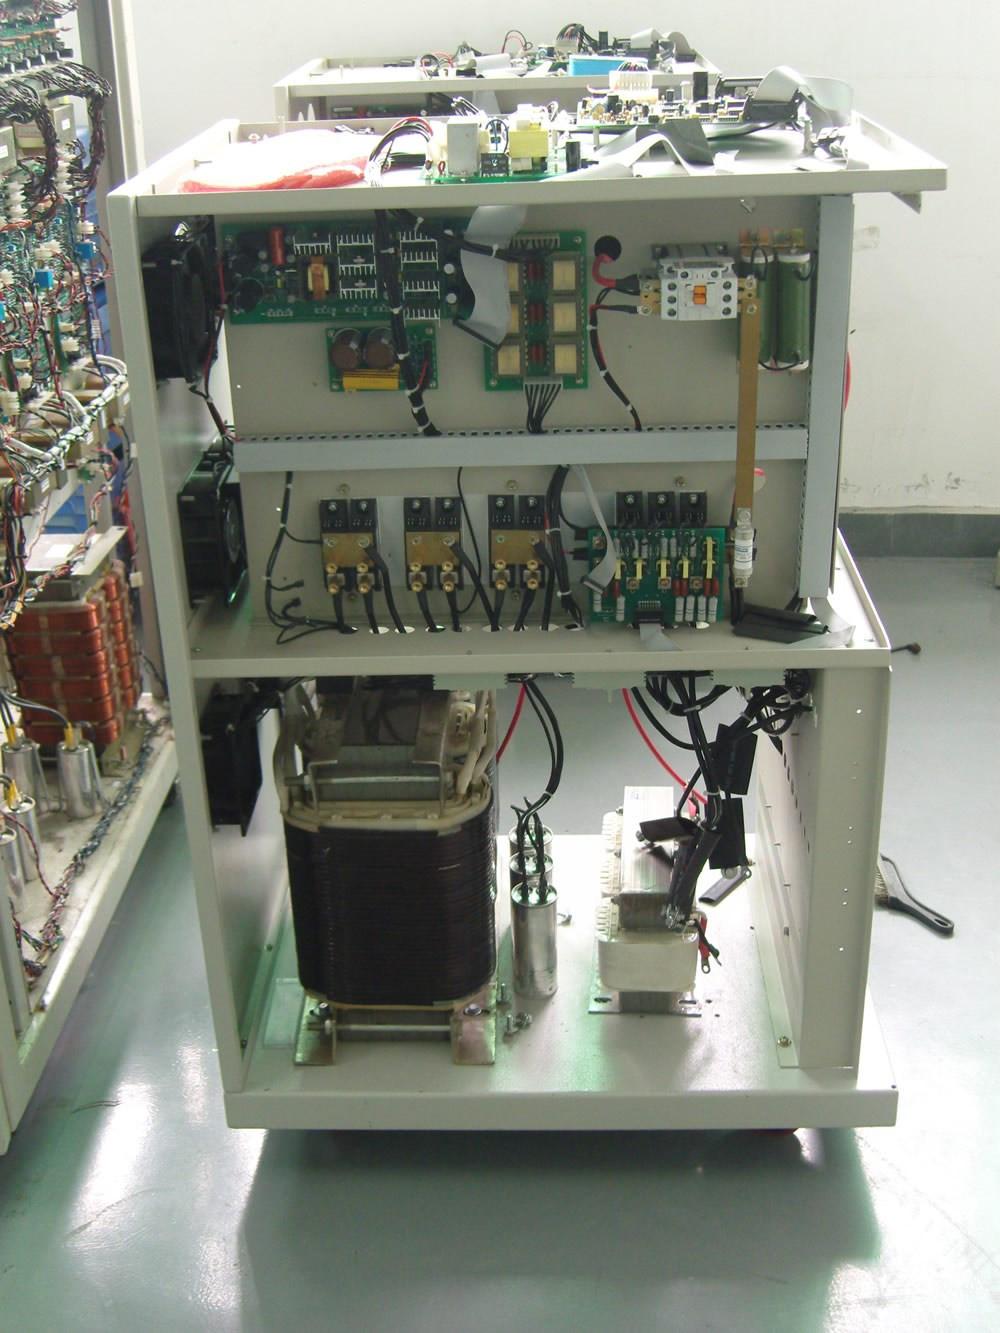 Bosin 照明用 ups不間斷電源80KW蓄電池